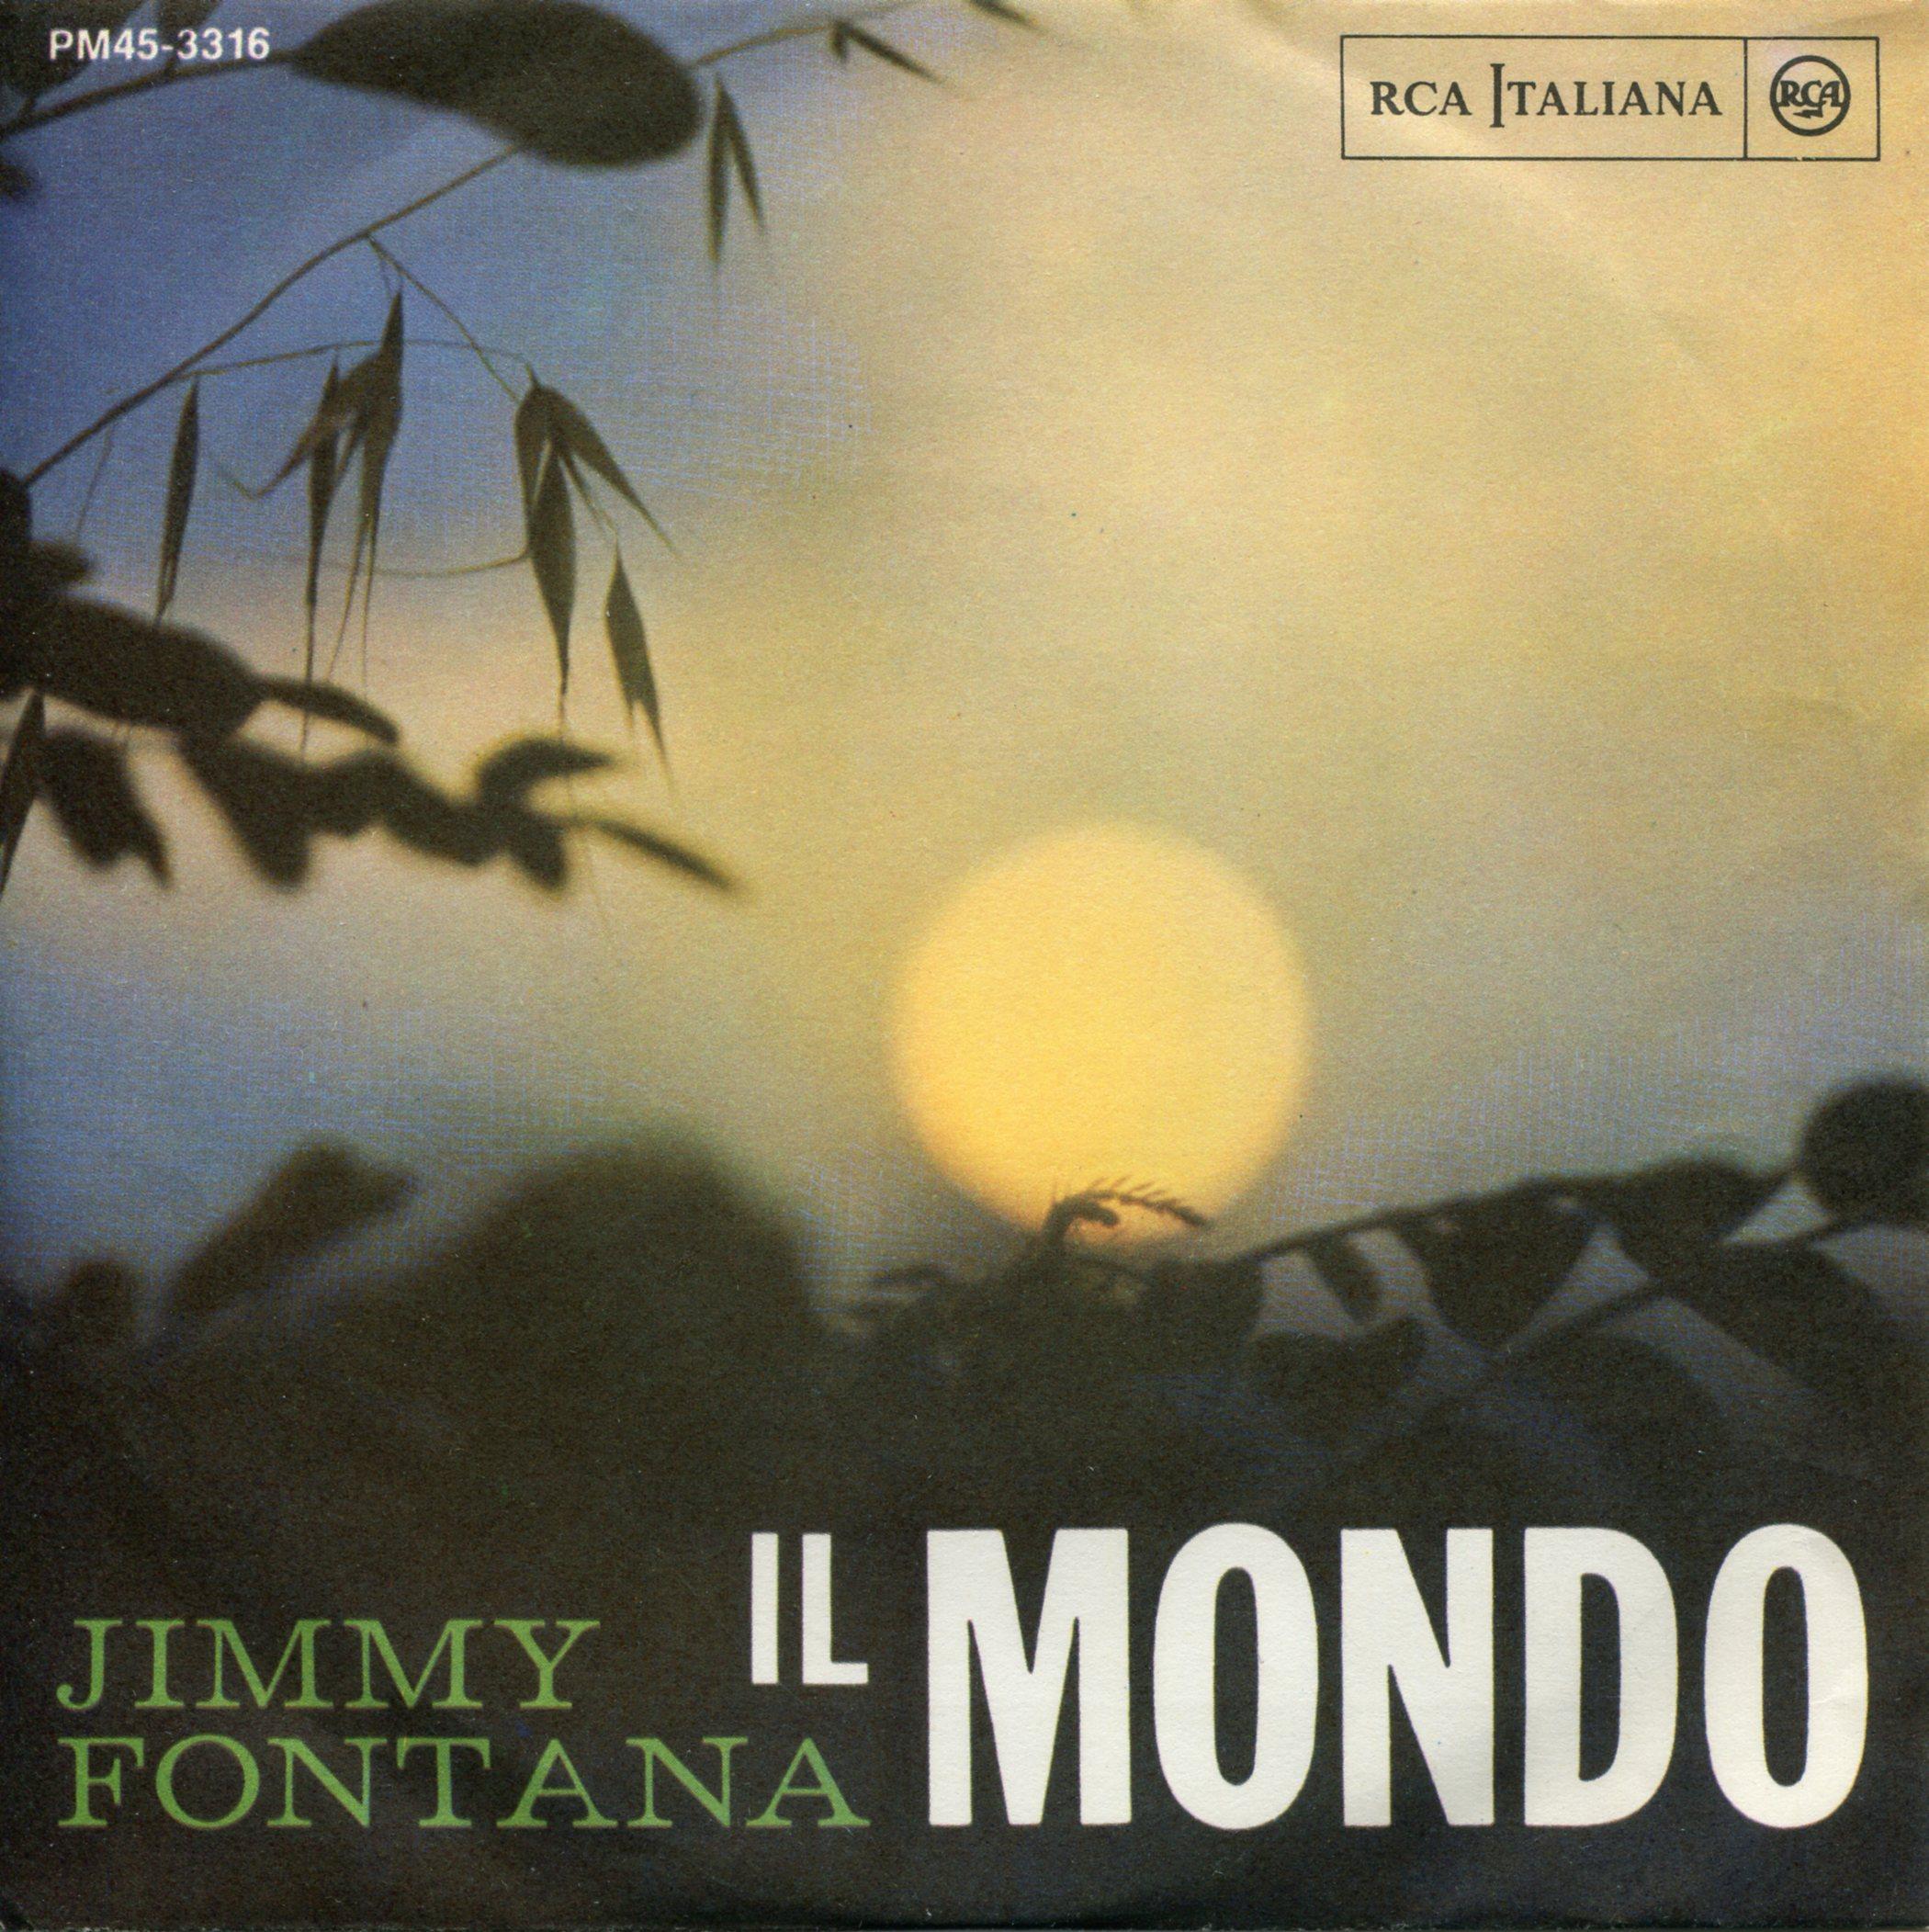 JIMMY FONTANA IL MONDO COPERTINA